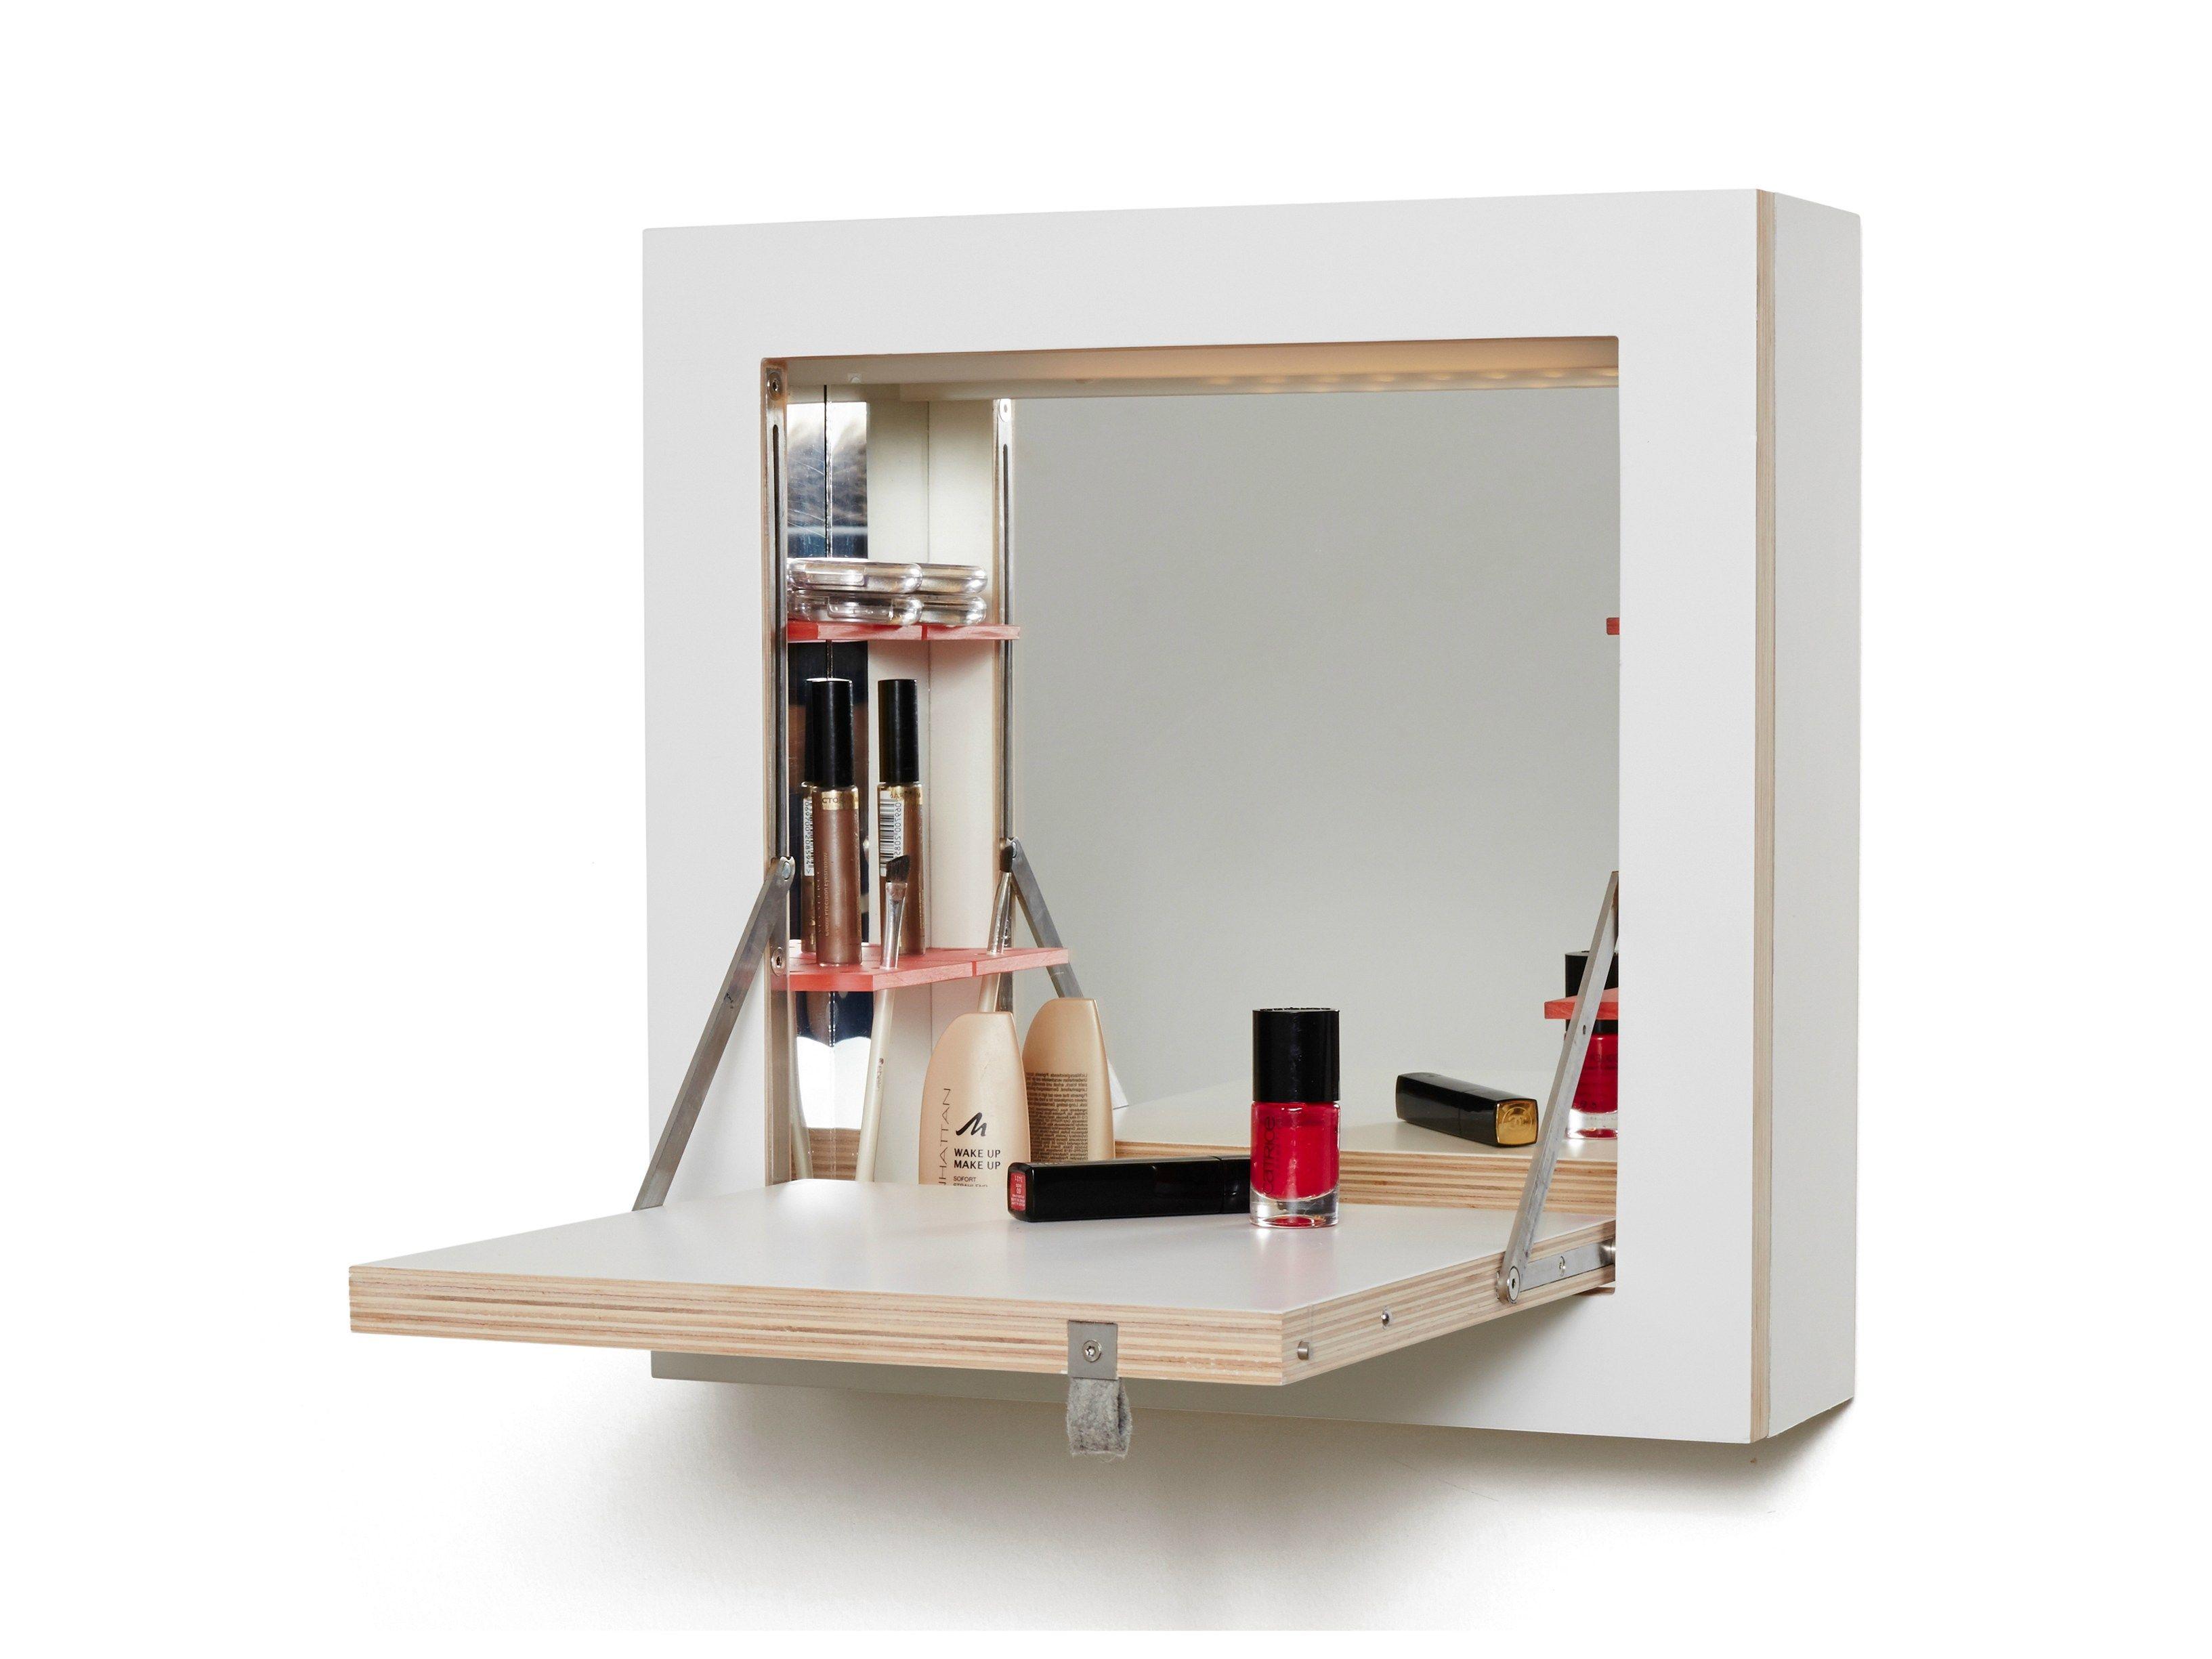 plywood dressing table fl pps schminkt nk by ambivalenz design malte grieb. Black Bedroom Furniture Sets. Home Design Ideas